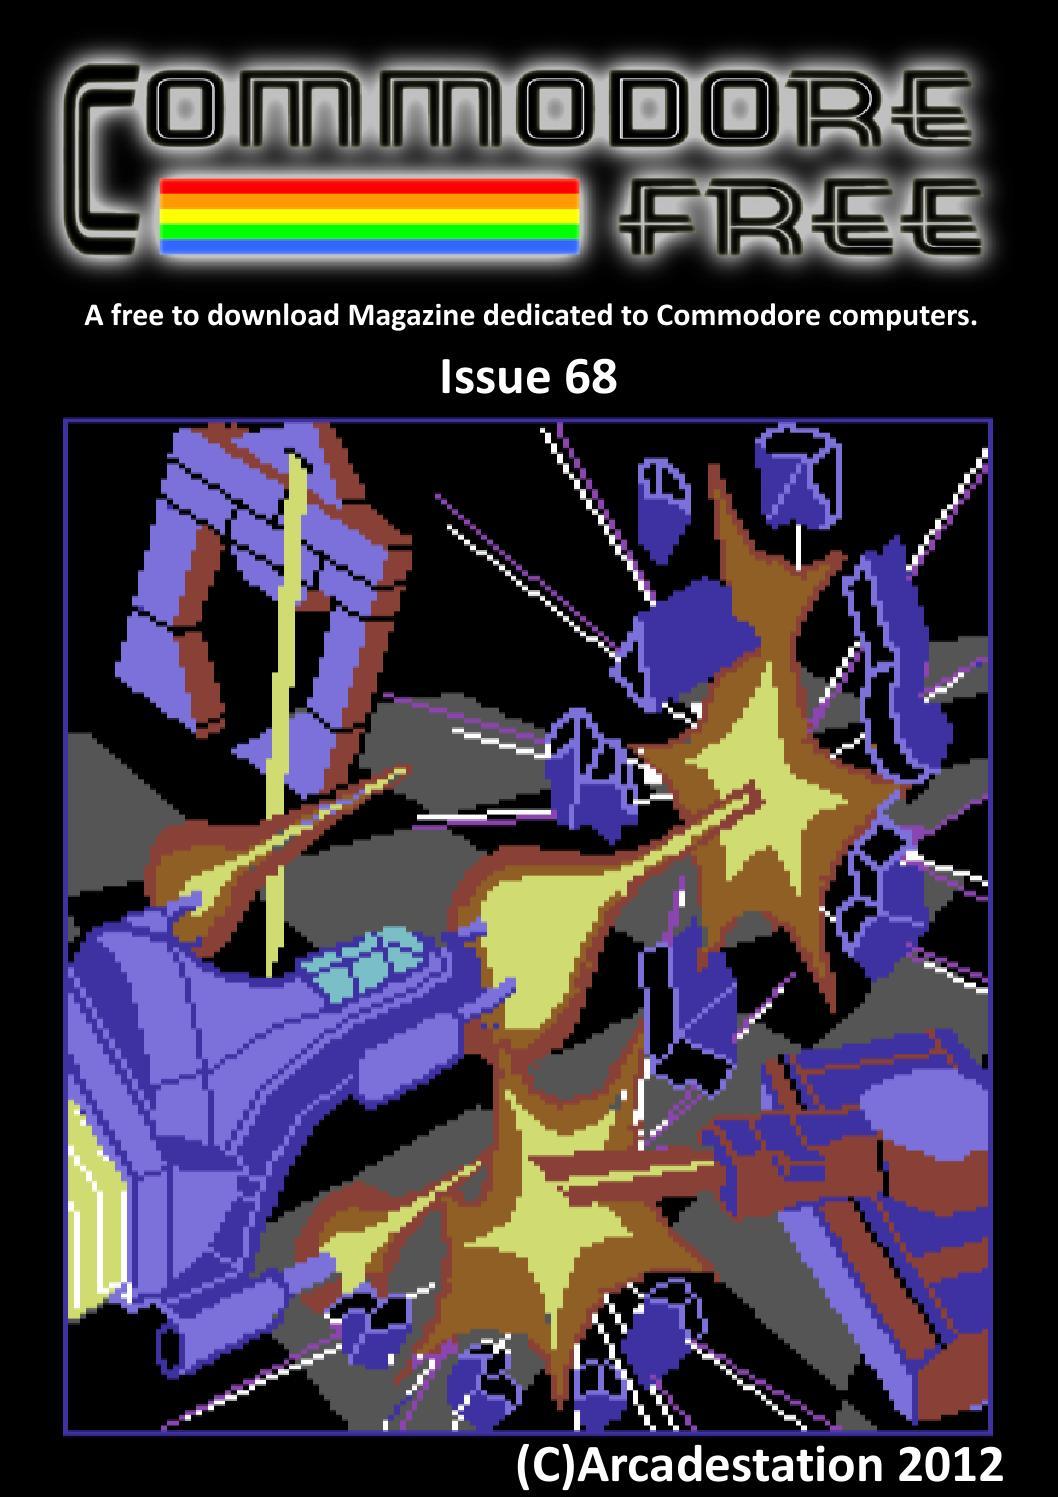 COMMODORE FREE Issue 68 by Commodore Free Magazine - issuu